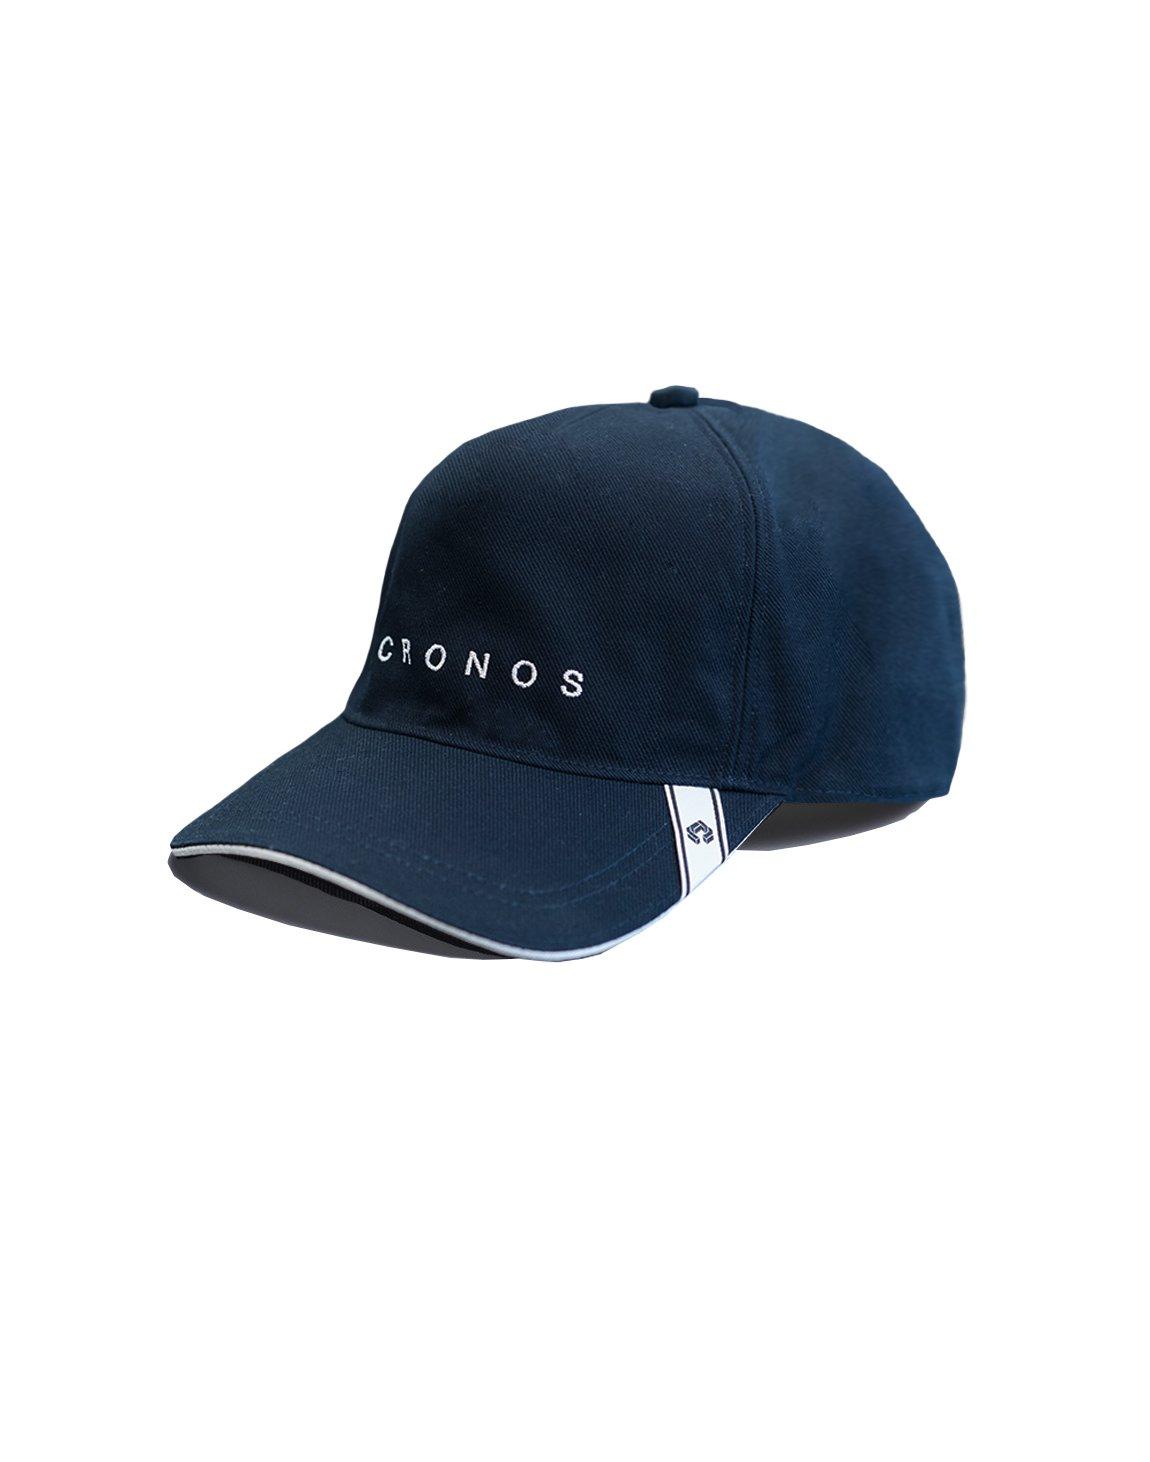 CRONOS FONT LOGO CAP【NAVY】